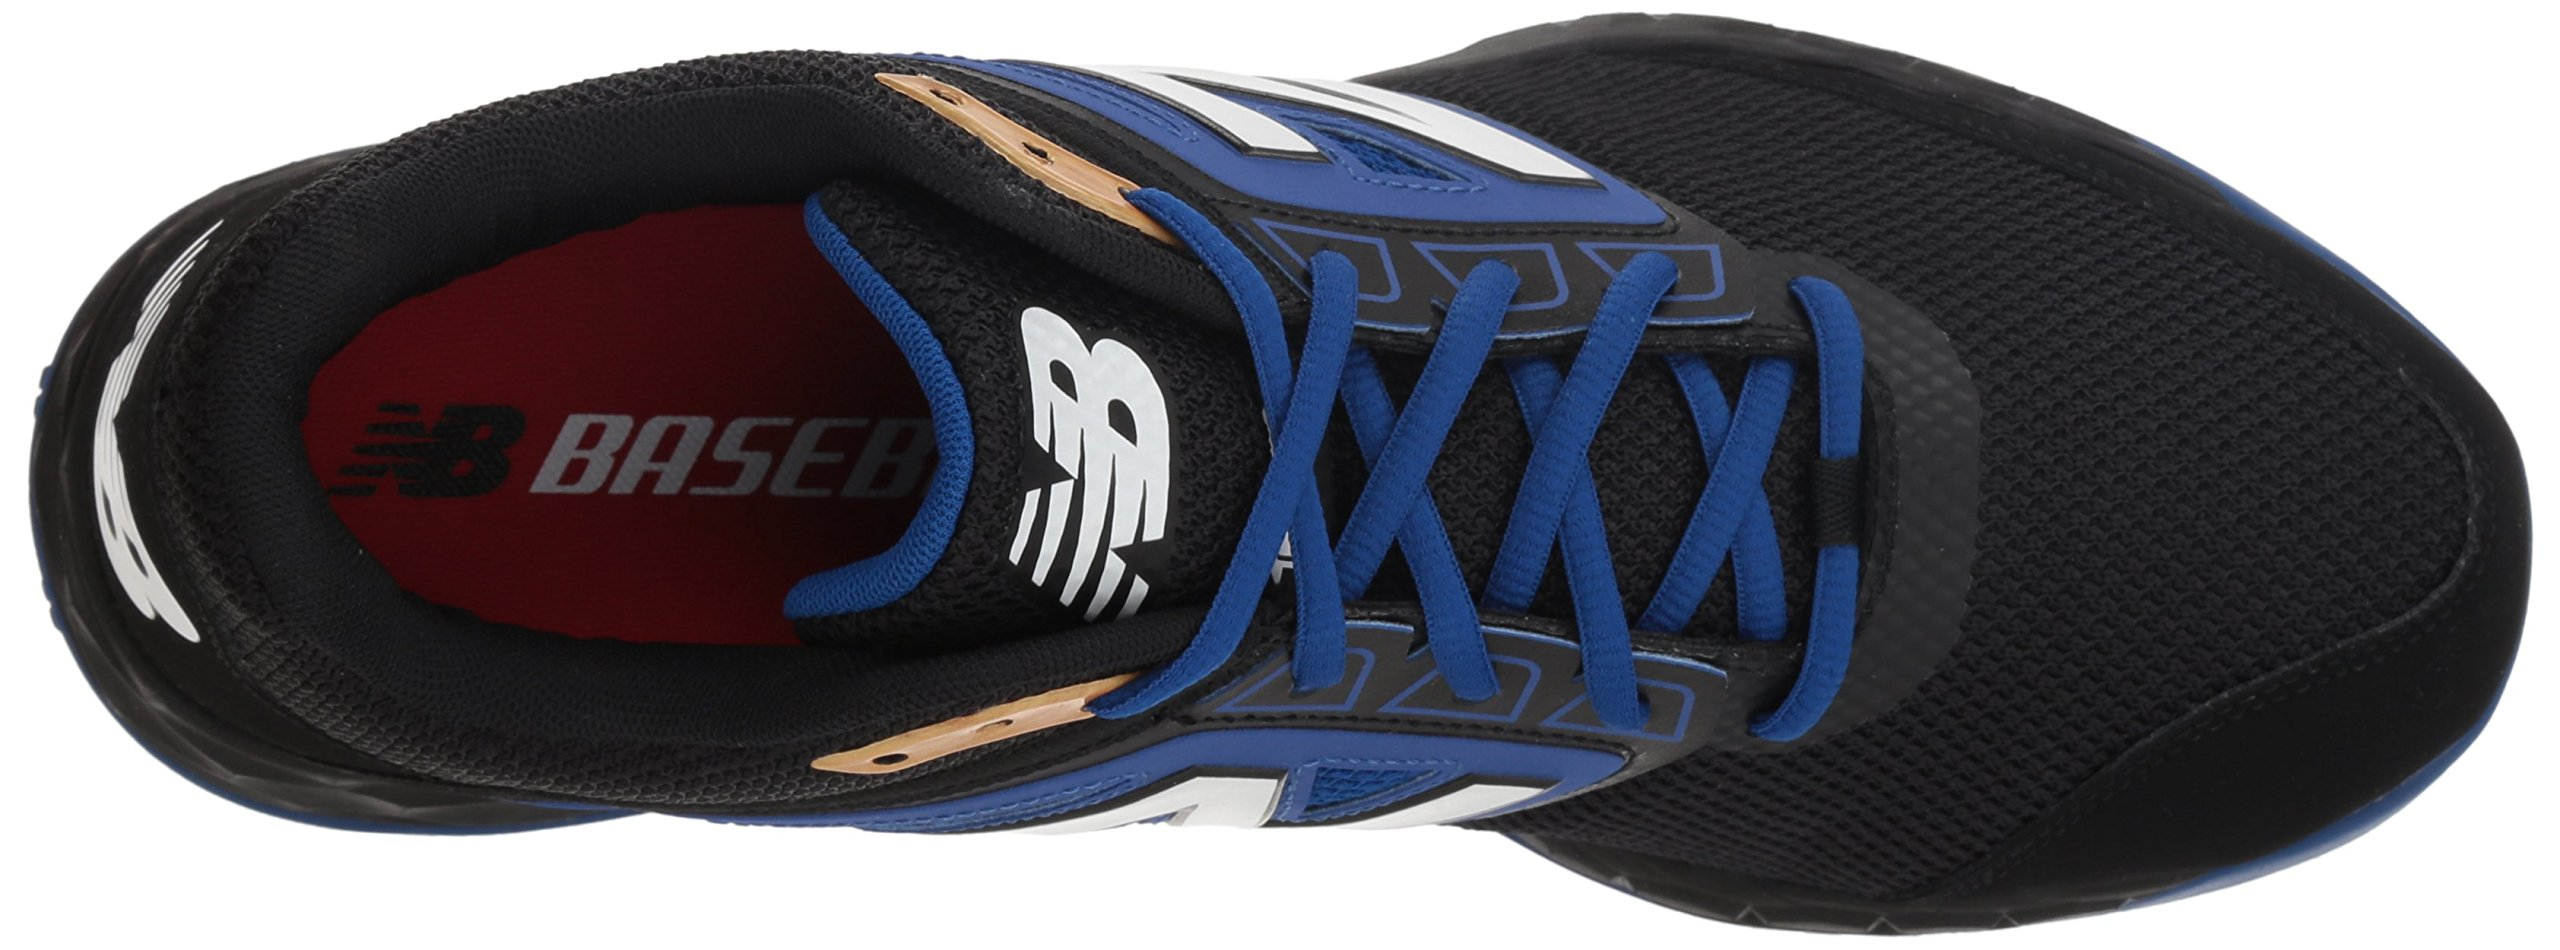 New Balance Men's 3000v4 Turf Baseball Shoe, Black/Blue, 5 D US by New Balance (Image #7)